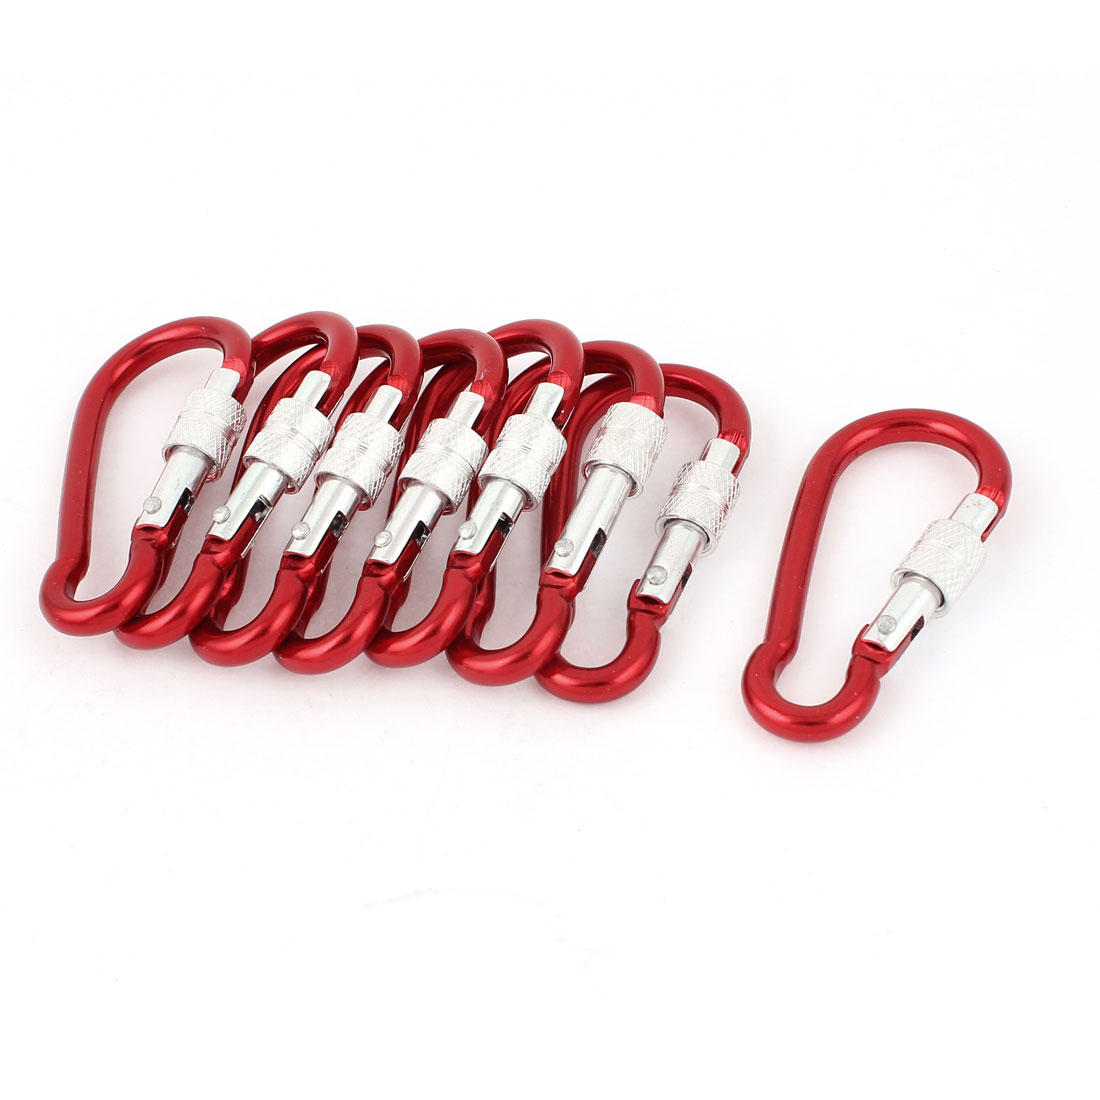 Outdoor Camping Red Spring Clip Snap Carabiner Hook Keyring Karabiner Key Holder 8pcs